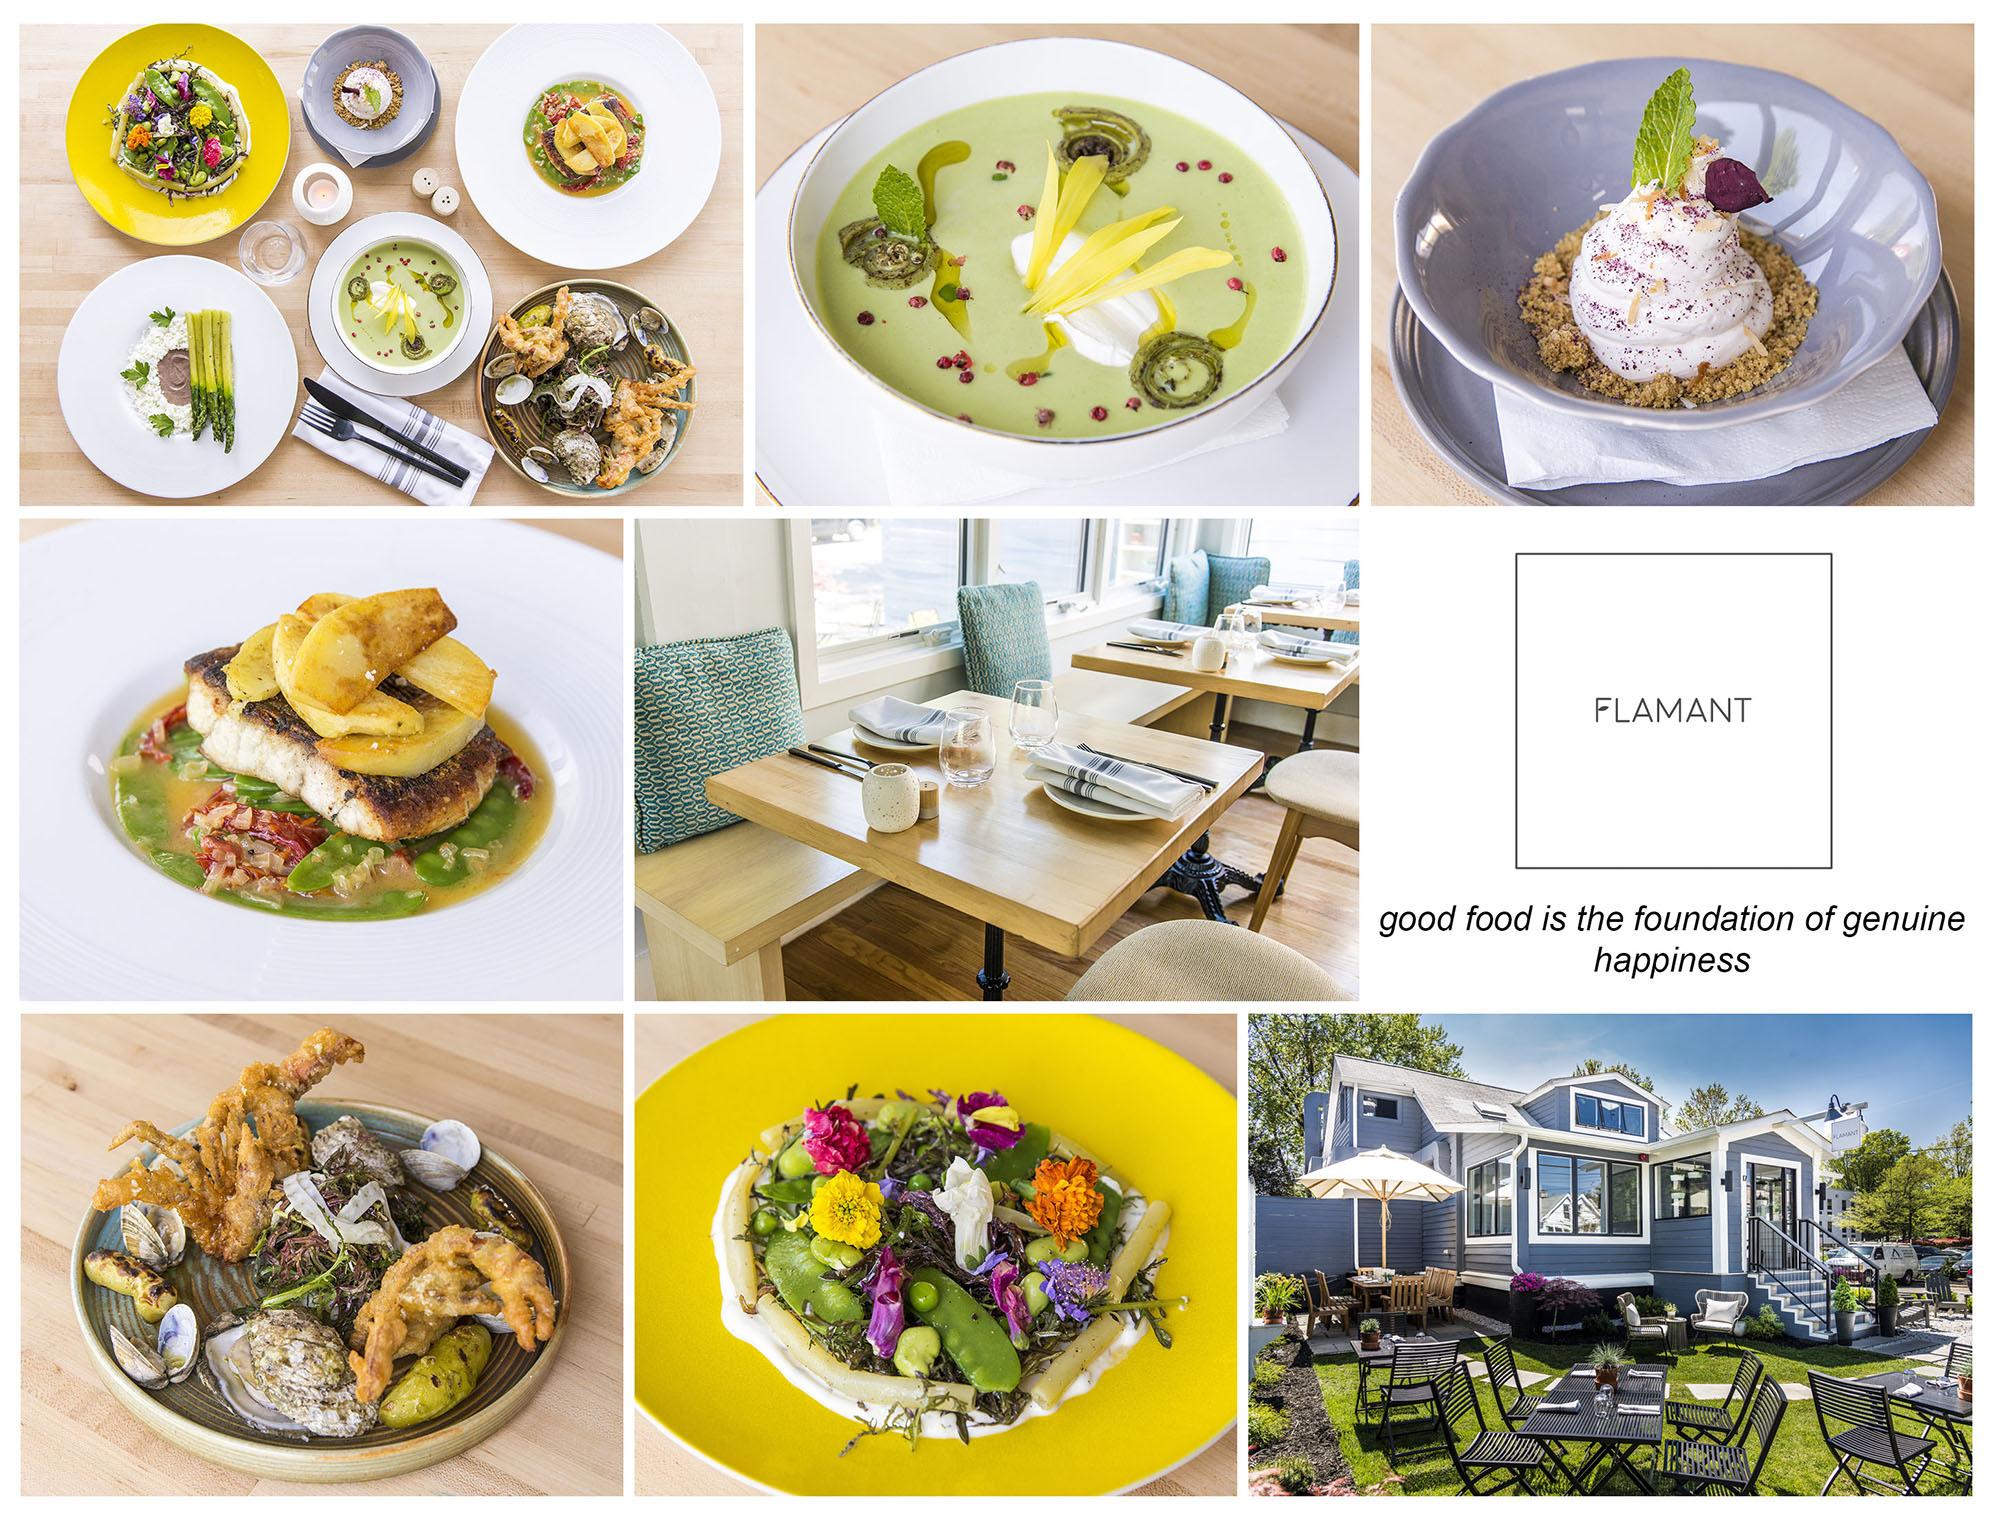 Flamant Restaurant Annapolis MD 2k web -